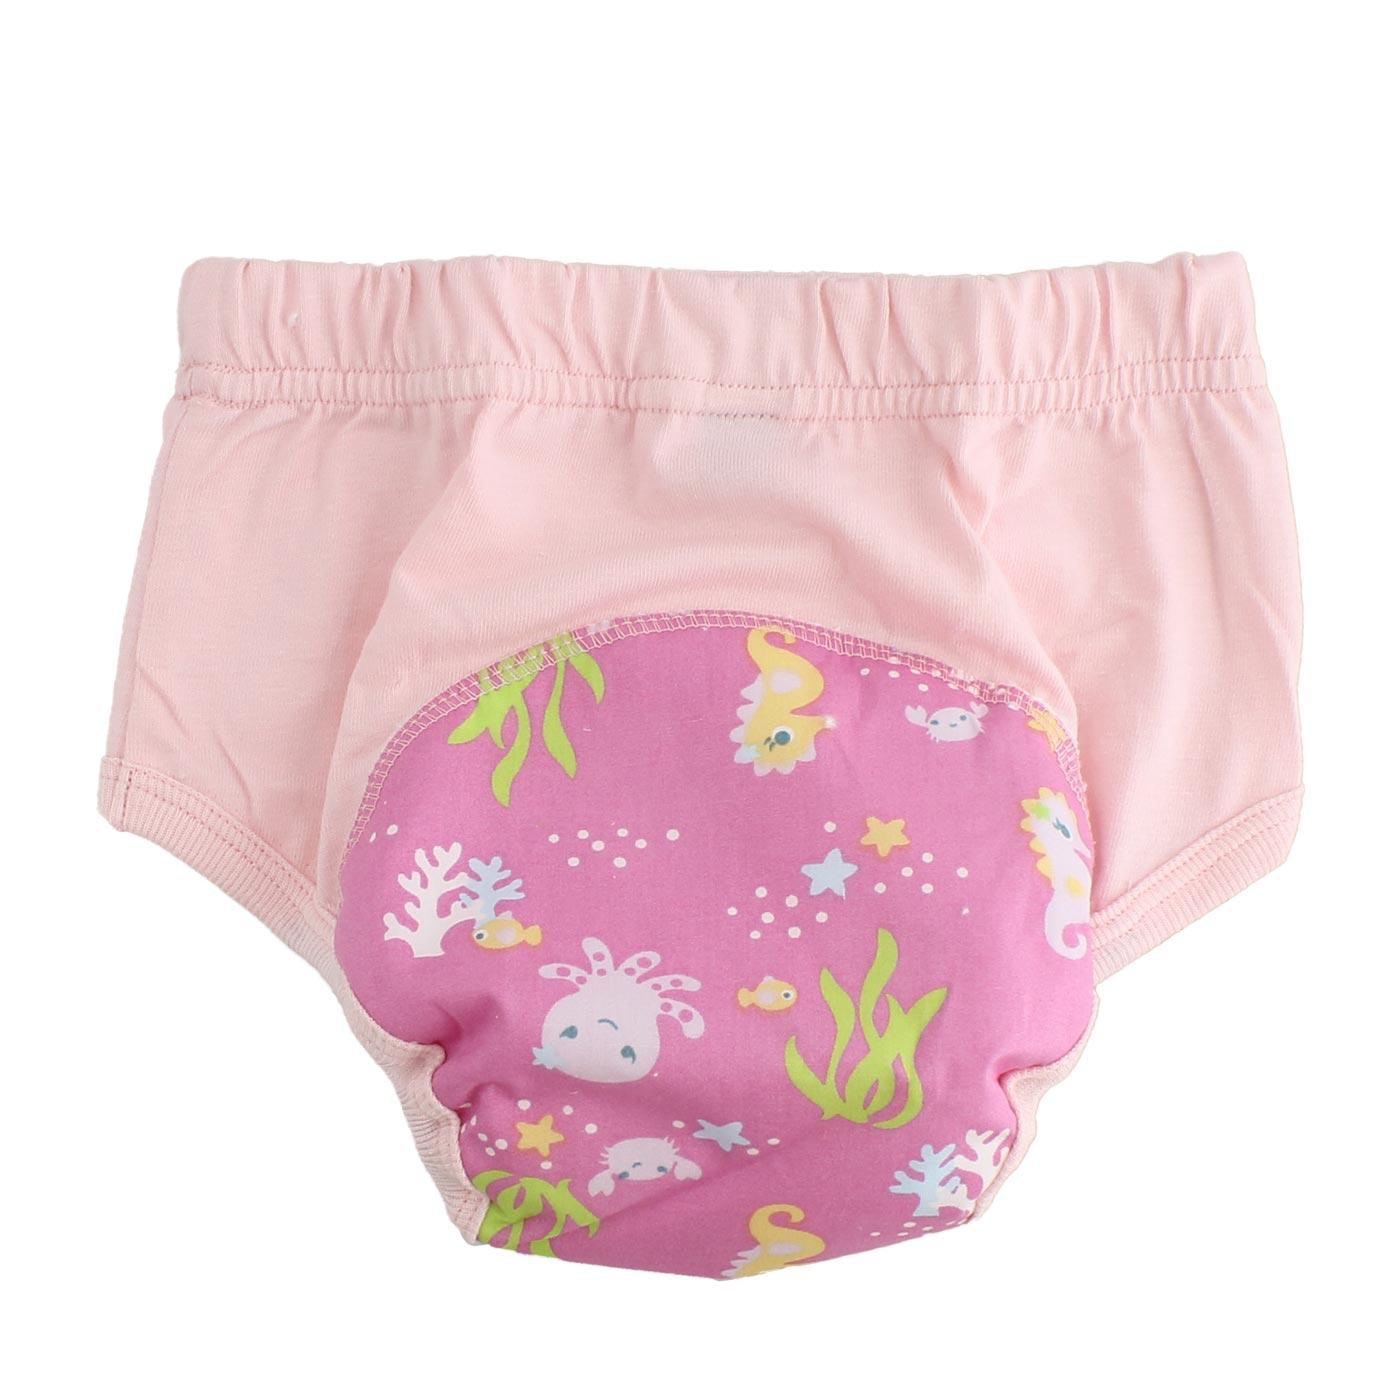 Klodiz Training Pant Pink Octo-M